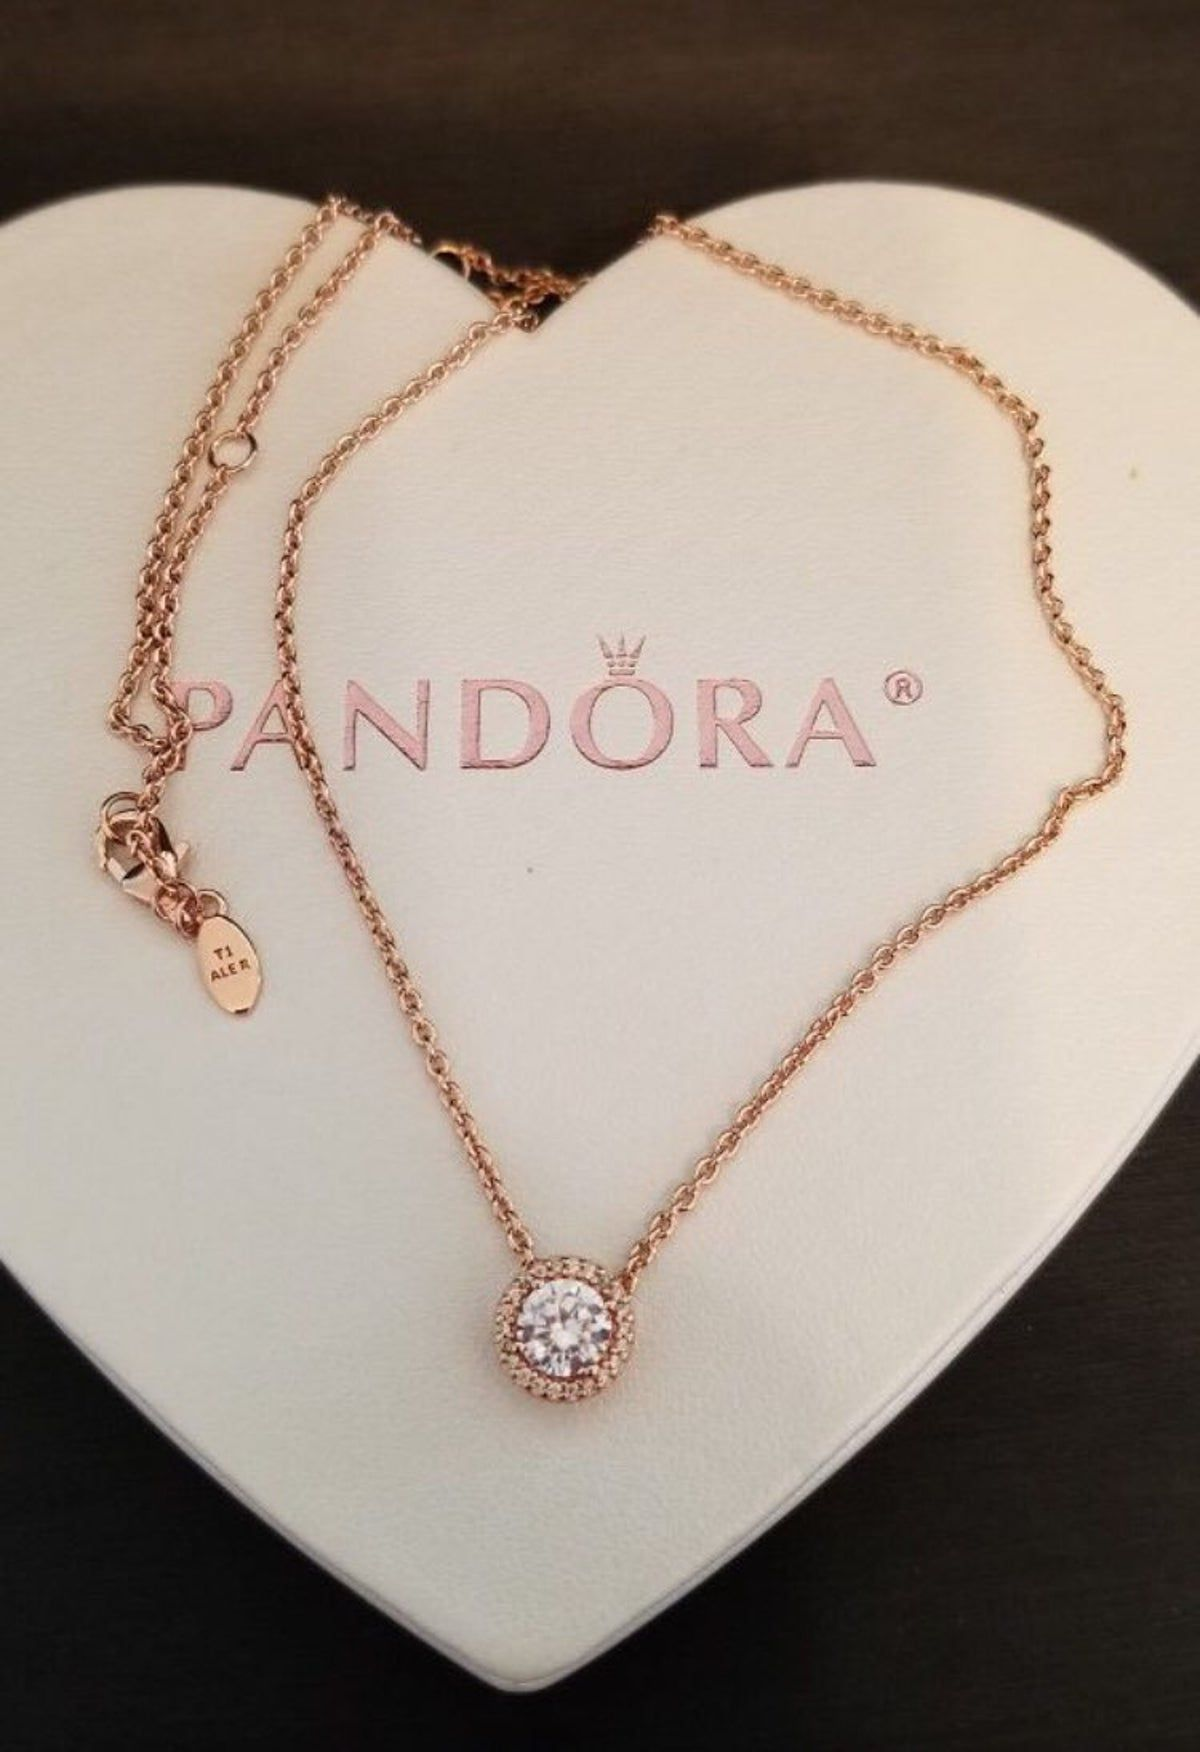 Pandora Rose Gold Tone Elegance Necklace Pandora Rose Gold Pandora Rose Pandora Necklace